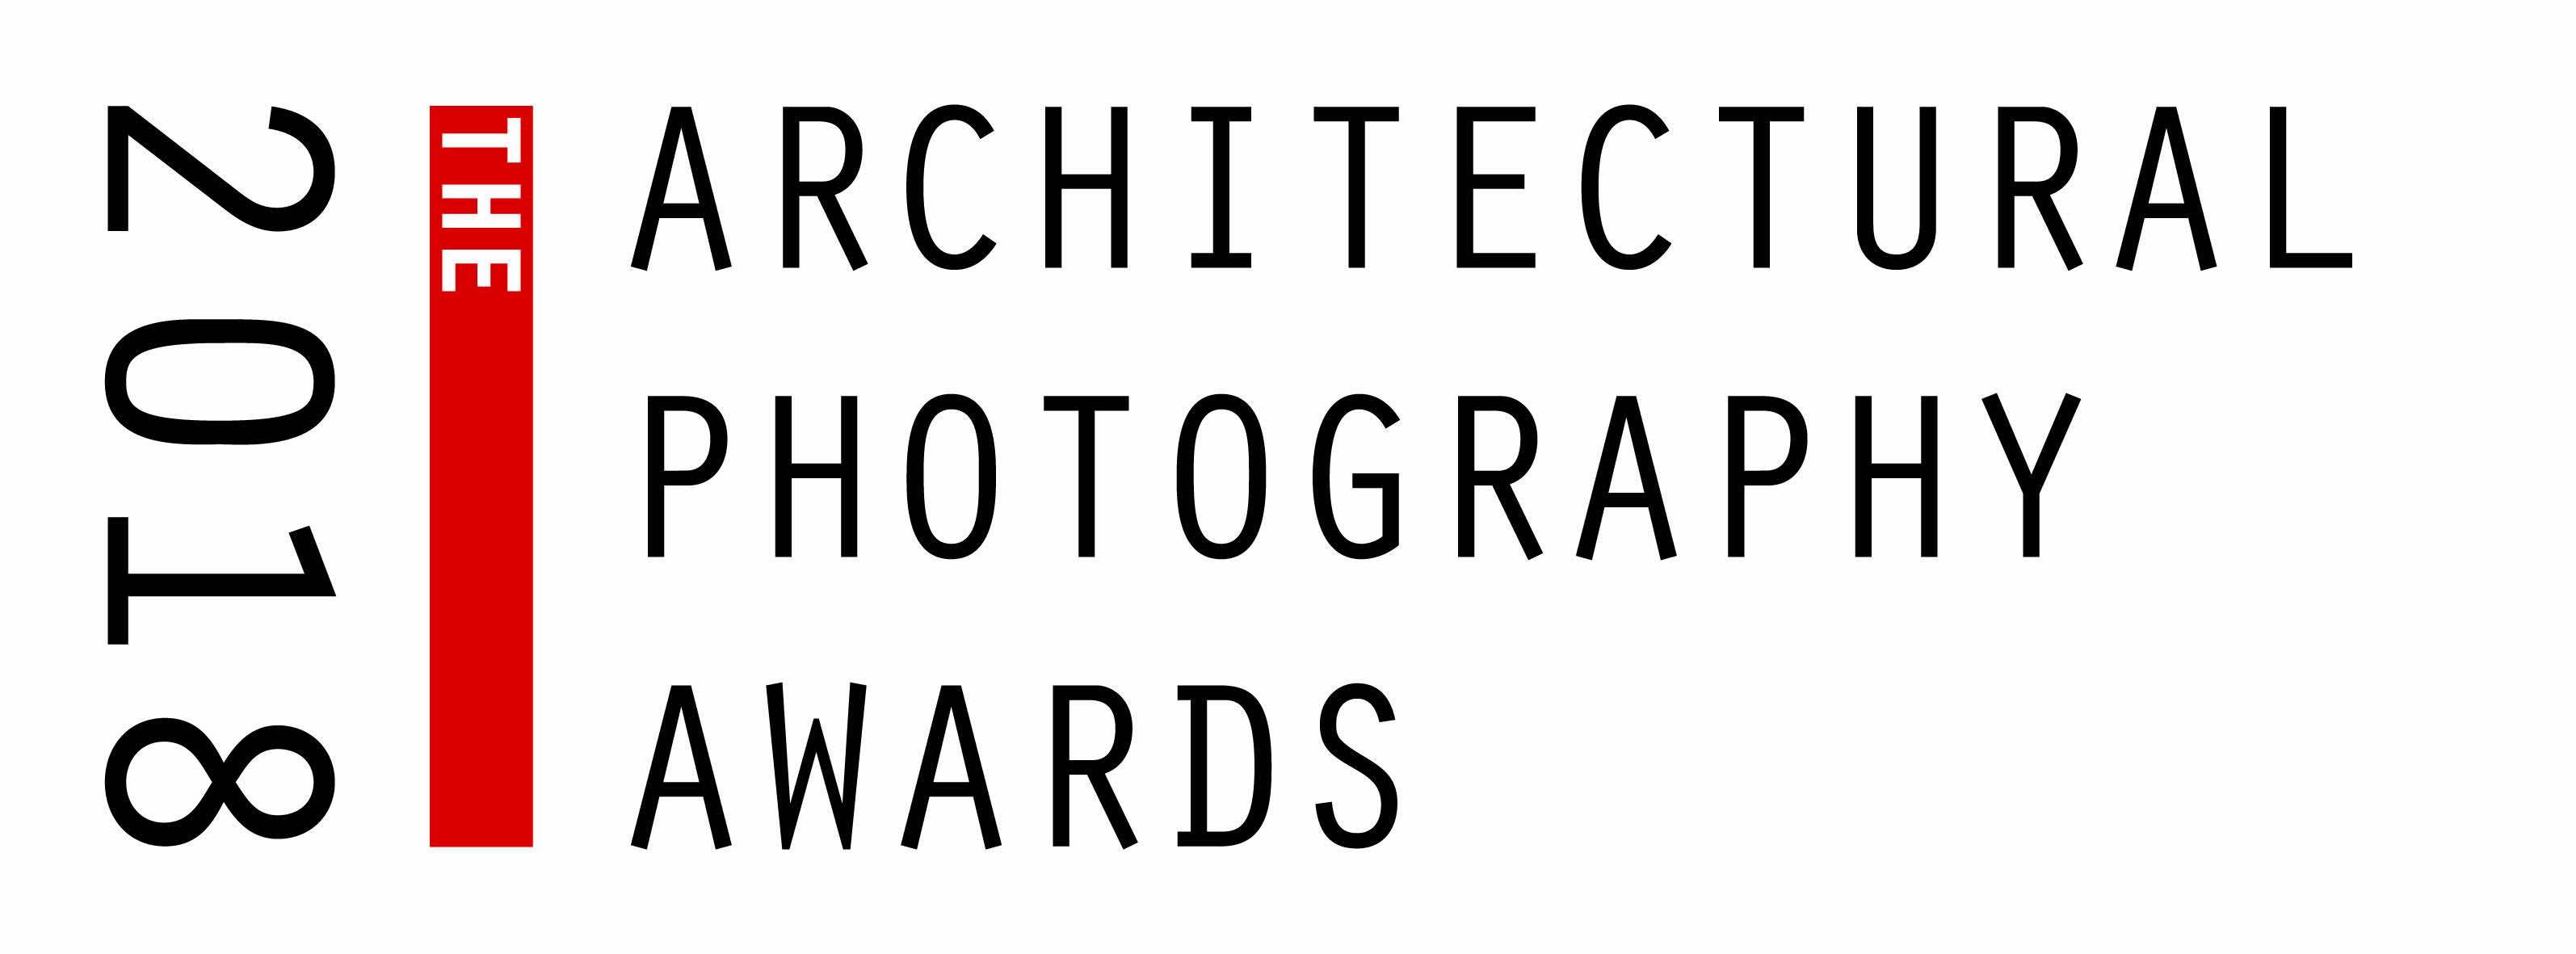 Architectural Photography Awards 2018 - logo